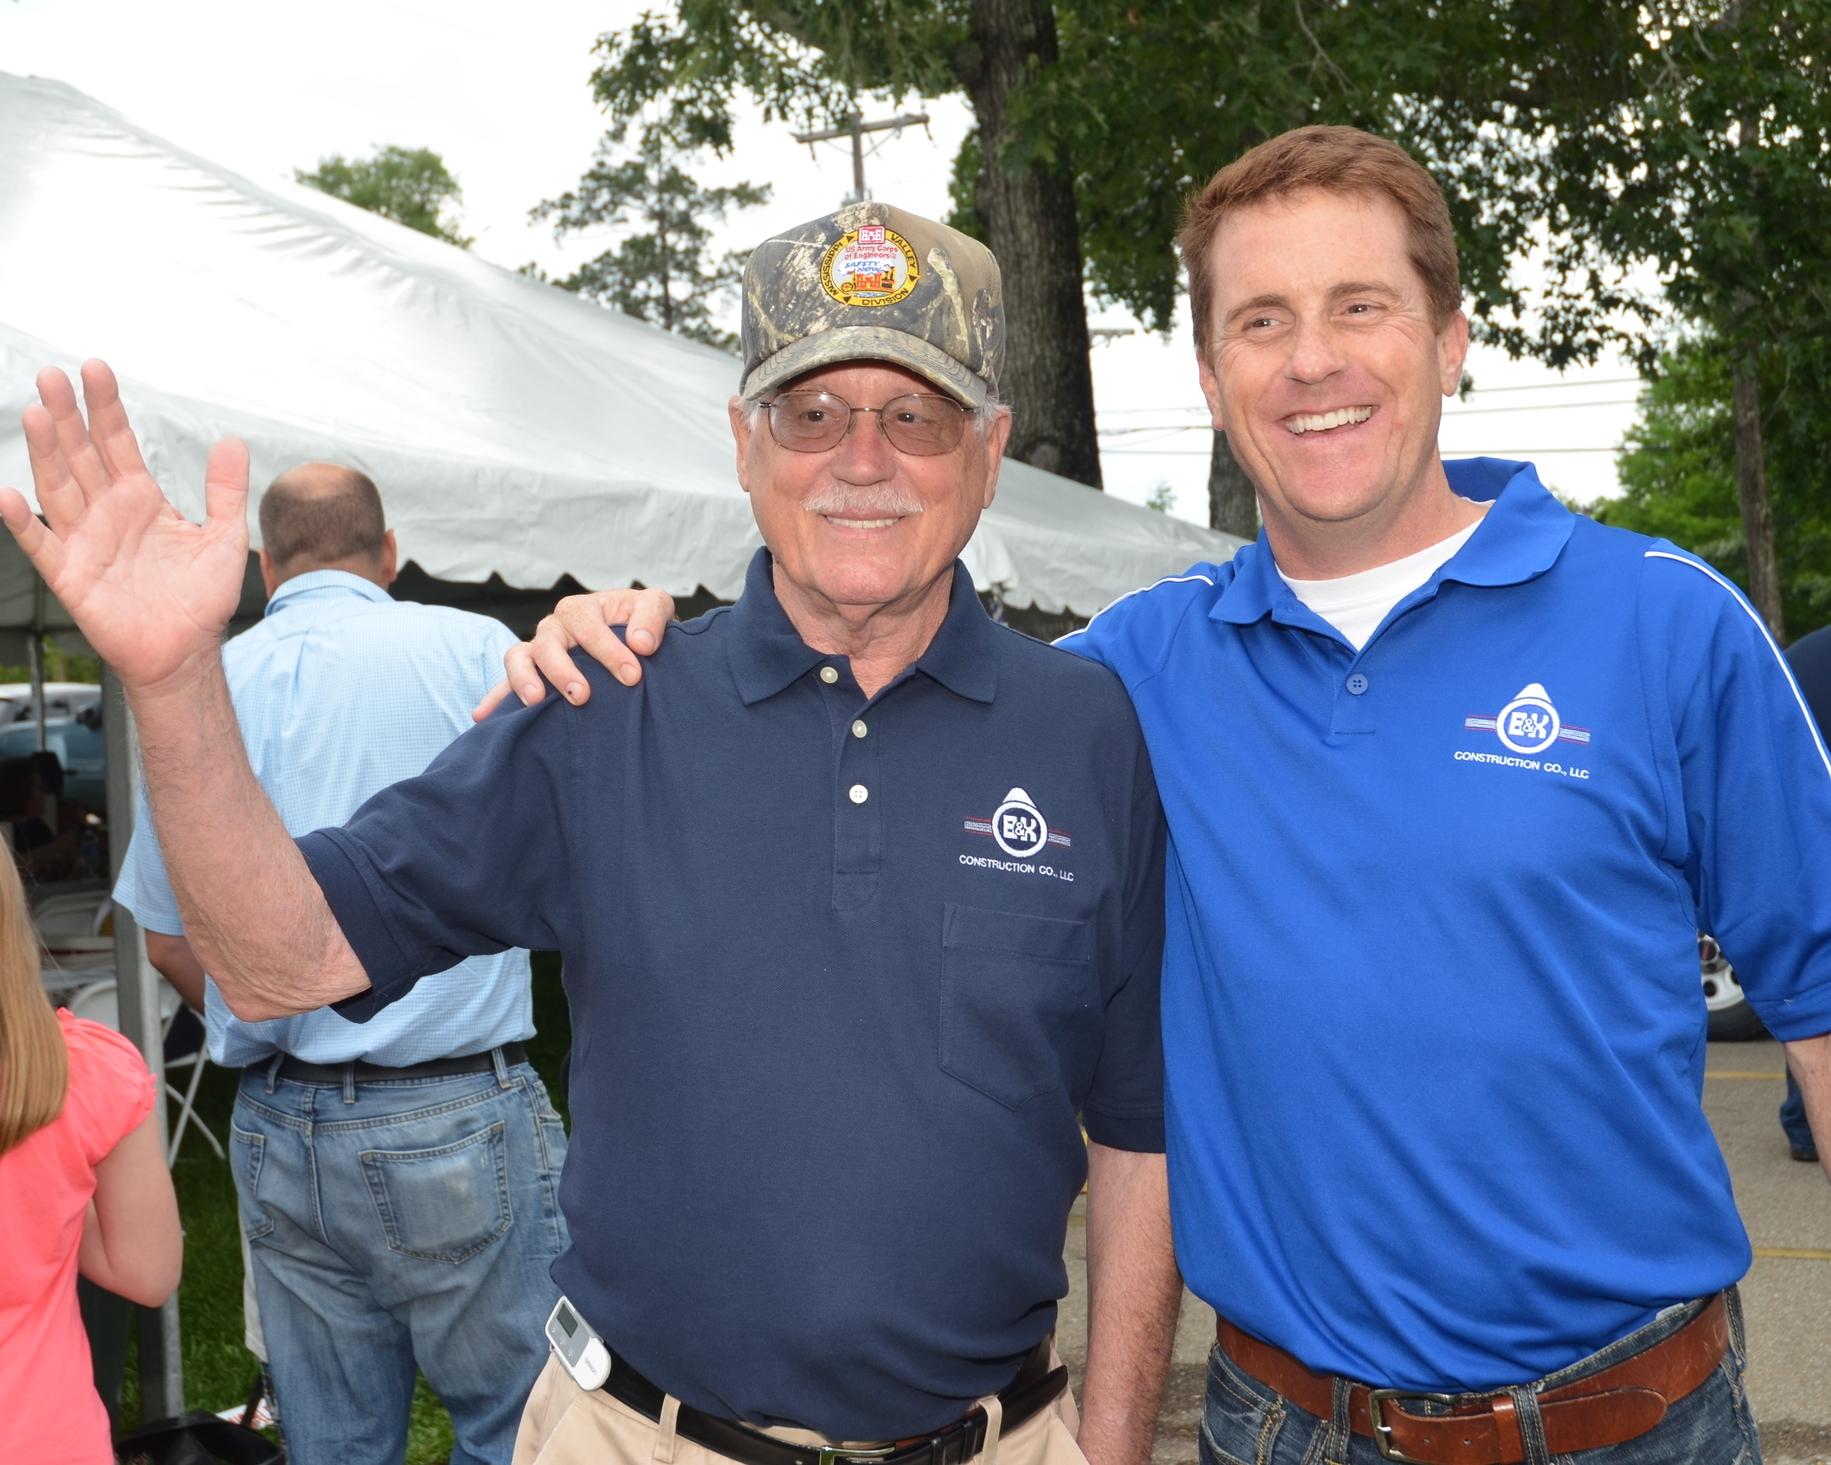 H.B Kenyon, President and Blake Andrews, Vice President